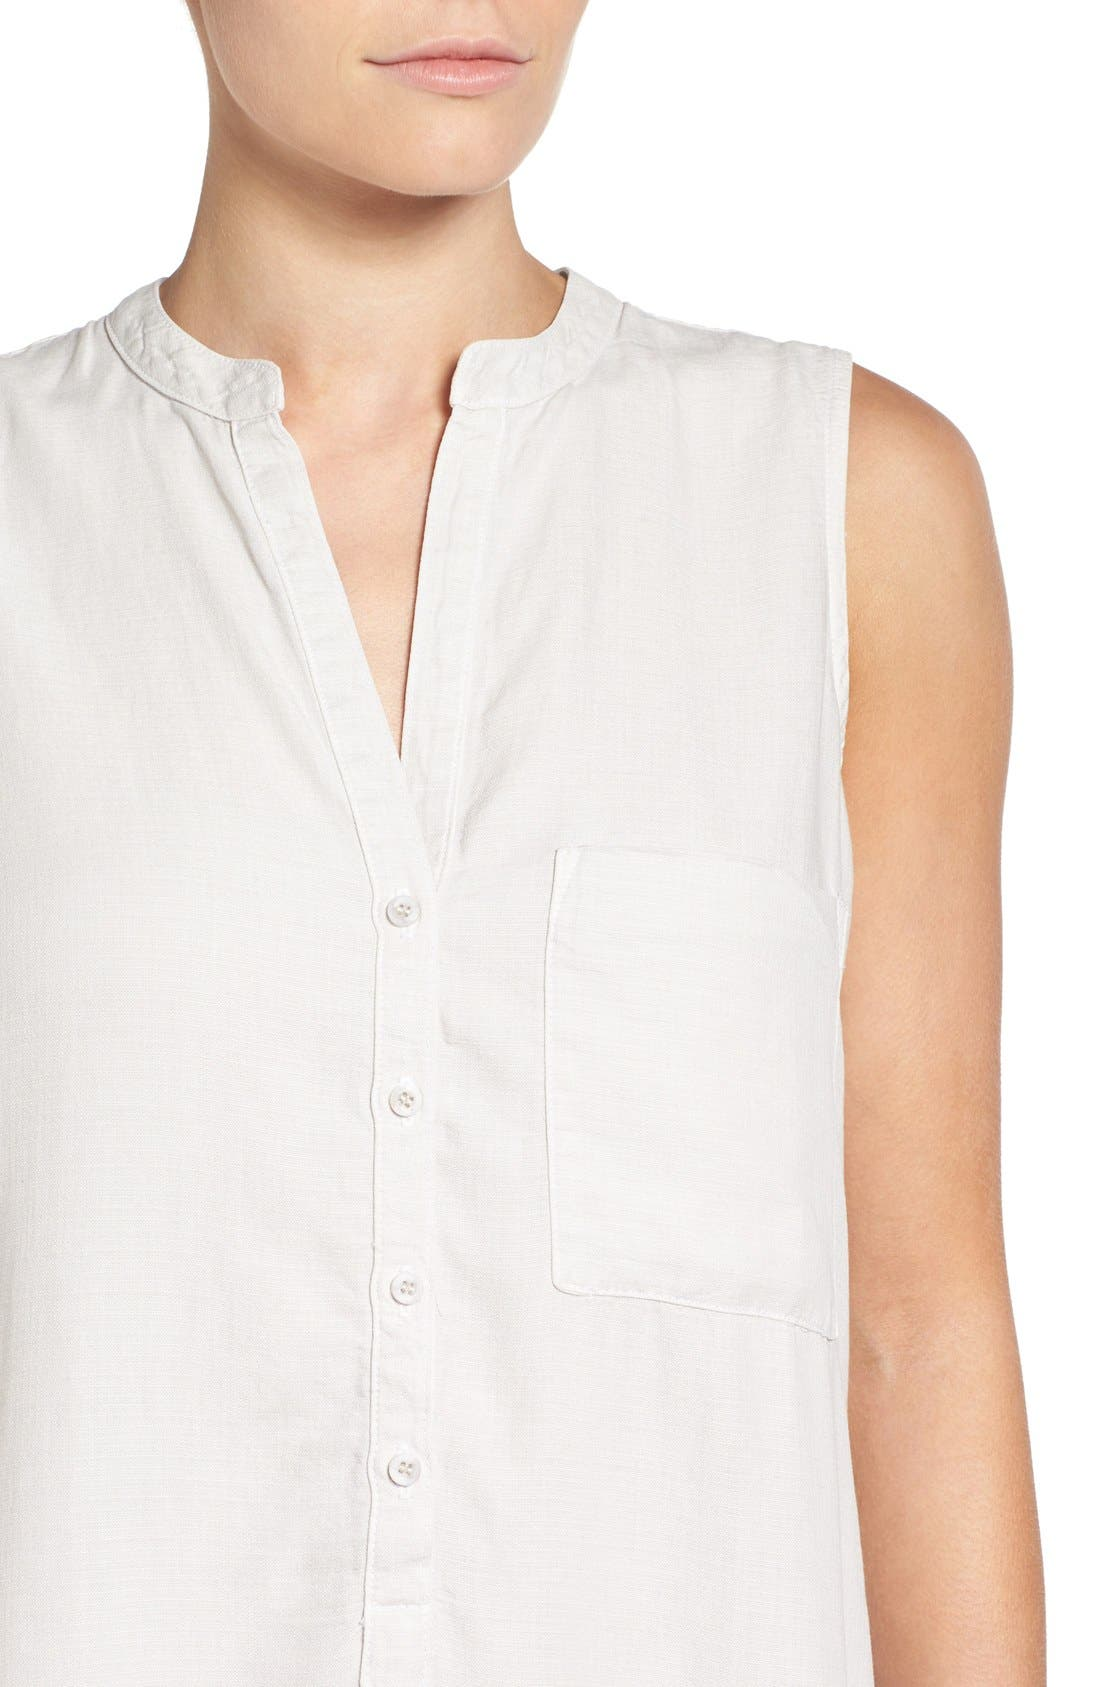 SIDE STITCH, Sleeveless Band Collar Shirtdress, Alternate thumbnail 5, color, 020